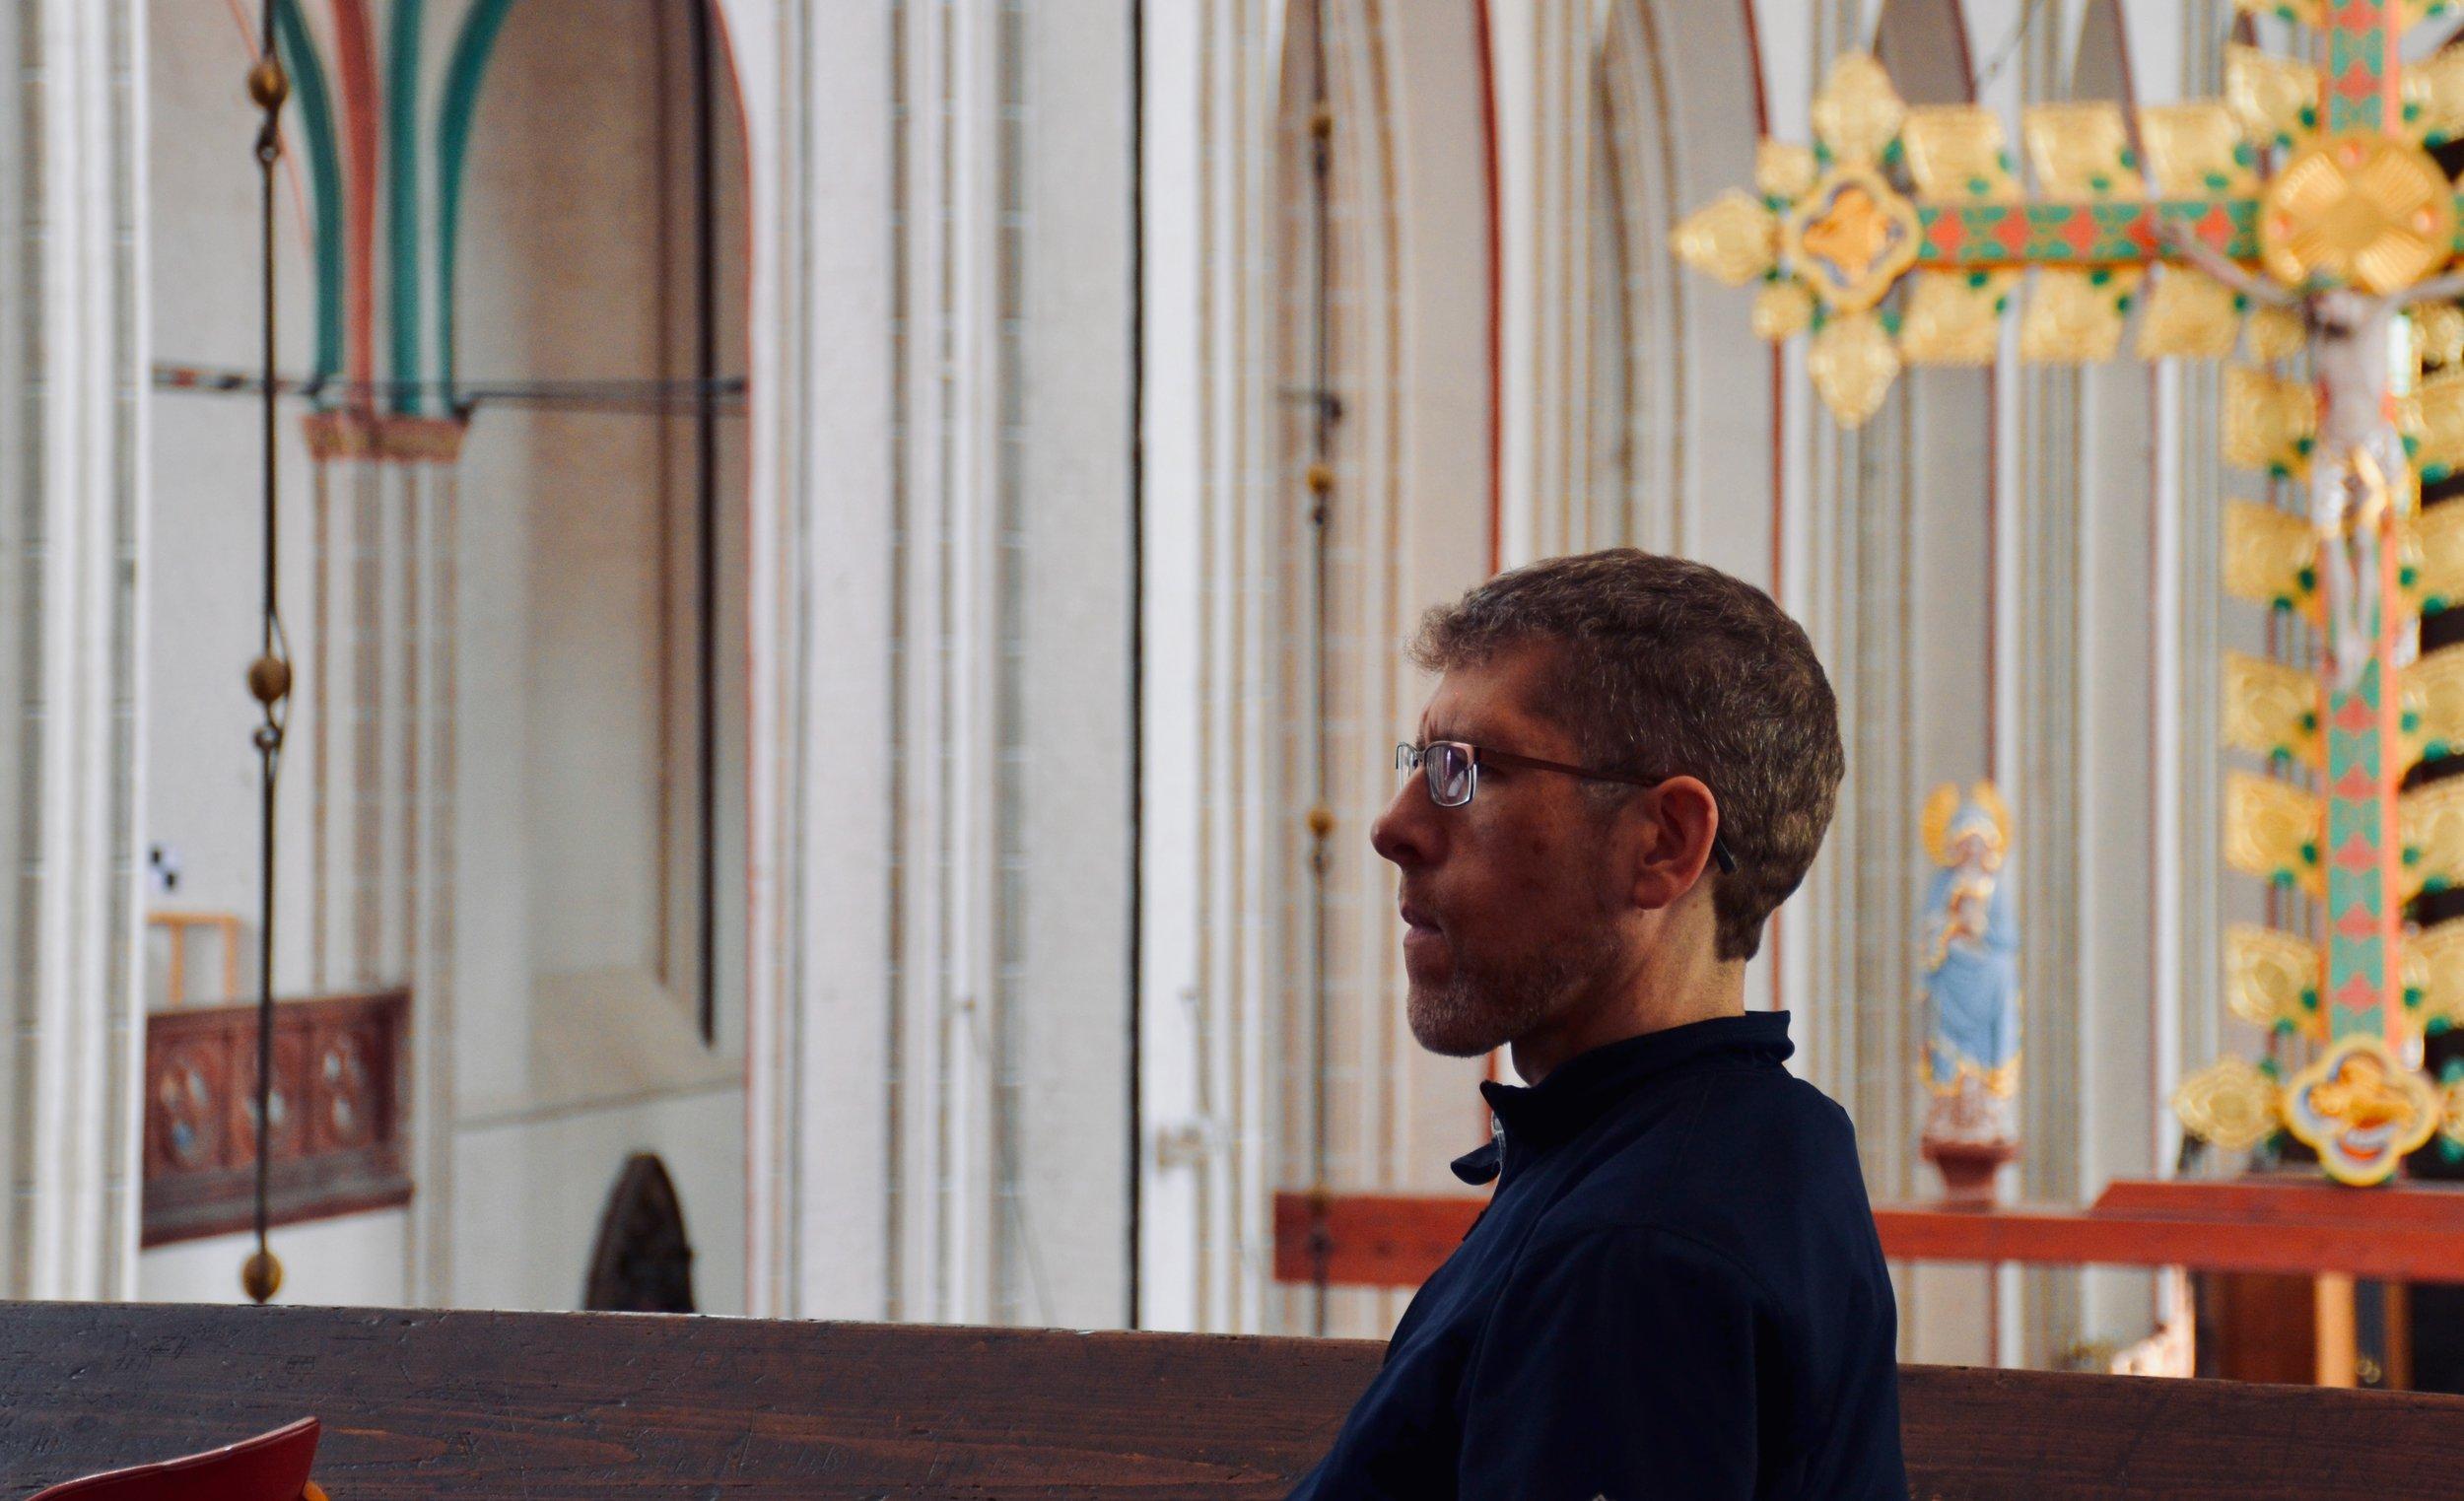 Chris Porter listens to the 1871 Ladegast Organ, Schwerin Dom. Boston Organ Studio.